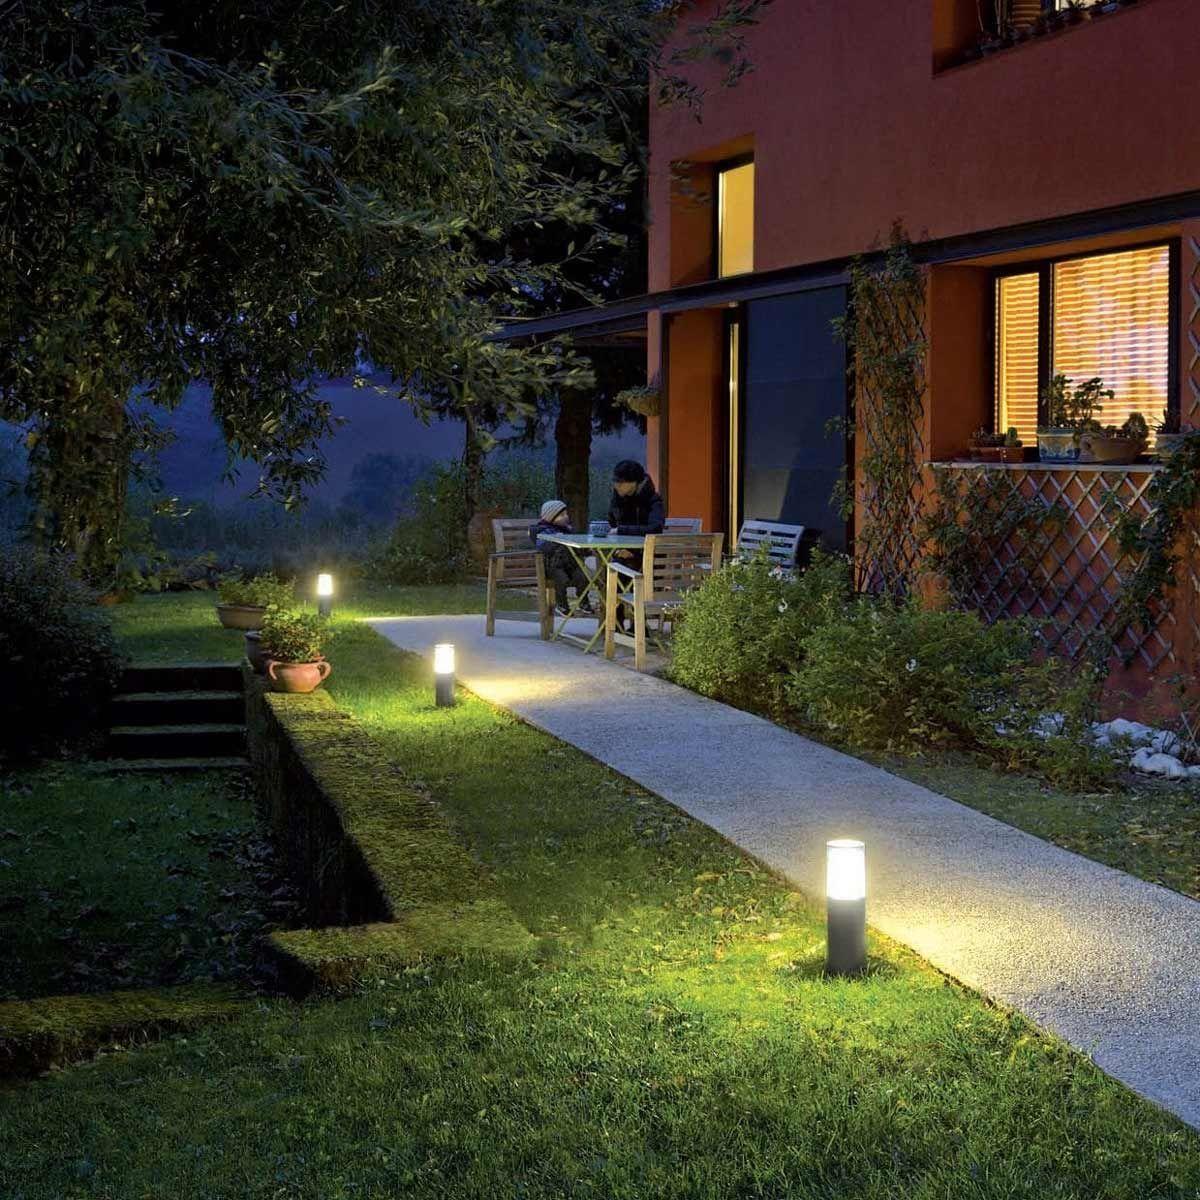 14 Outdoor Lighting Trends For 2018 Solar Lights Garden Outdoor Path Lighting Garden Path Lighting